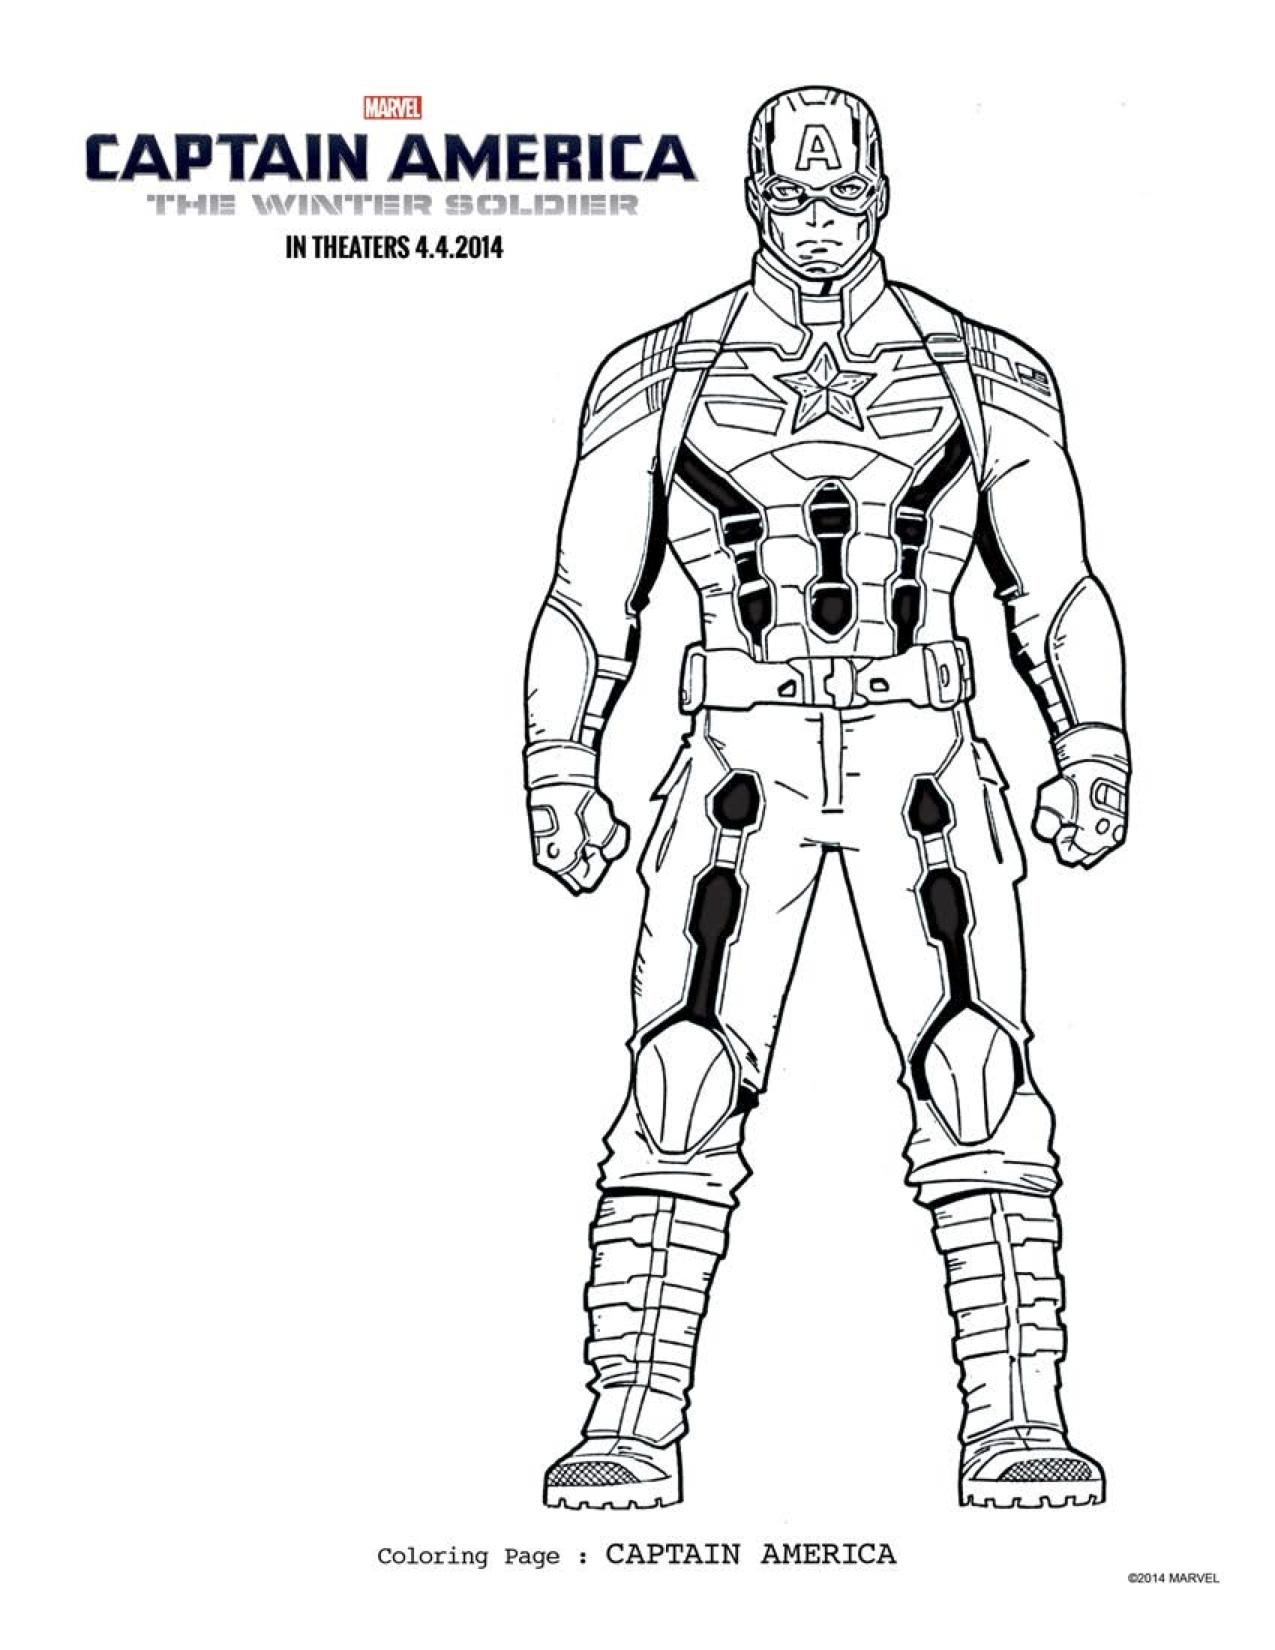 156 dibujos de Capitán américa para colorear | Oh Kids | Page 16